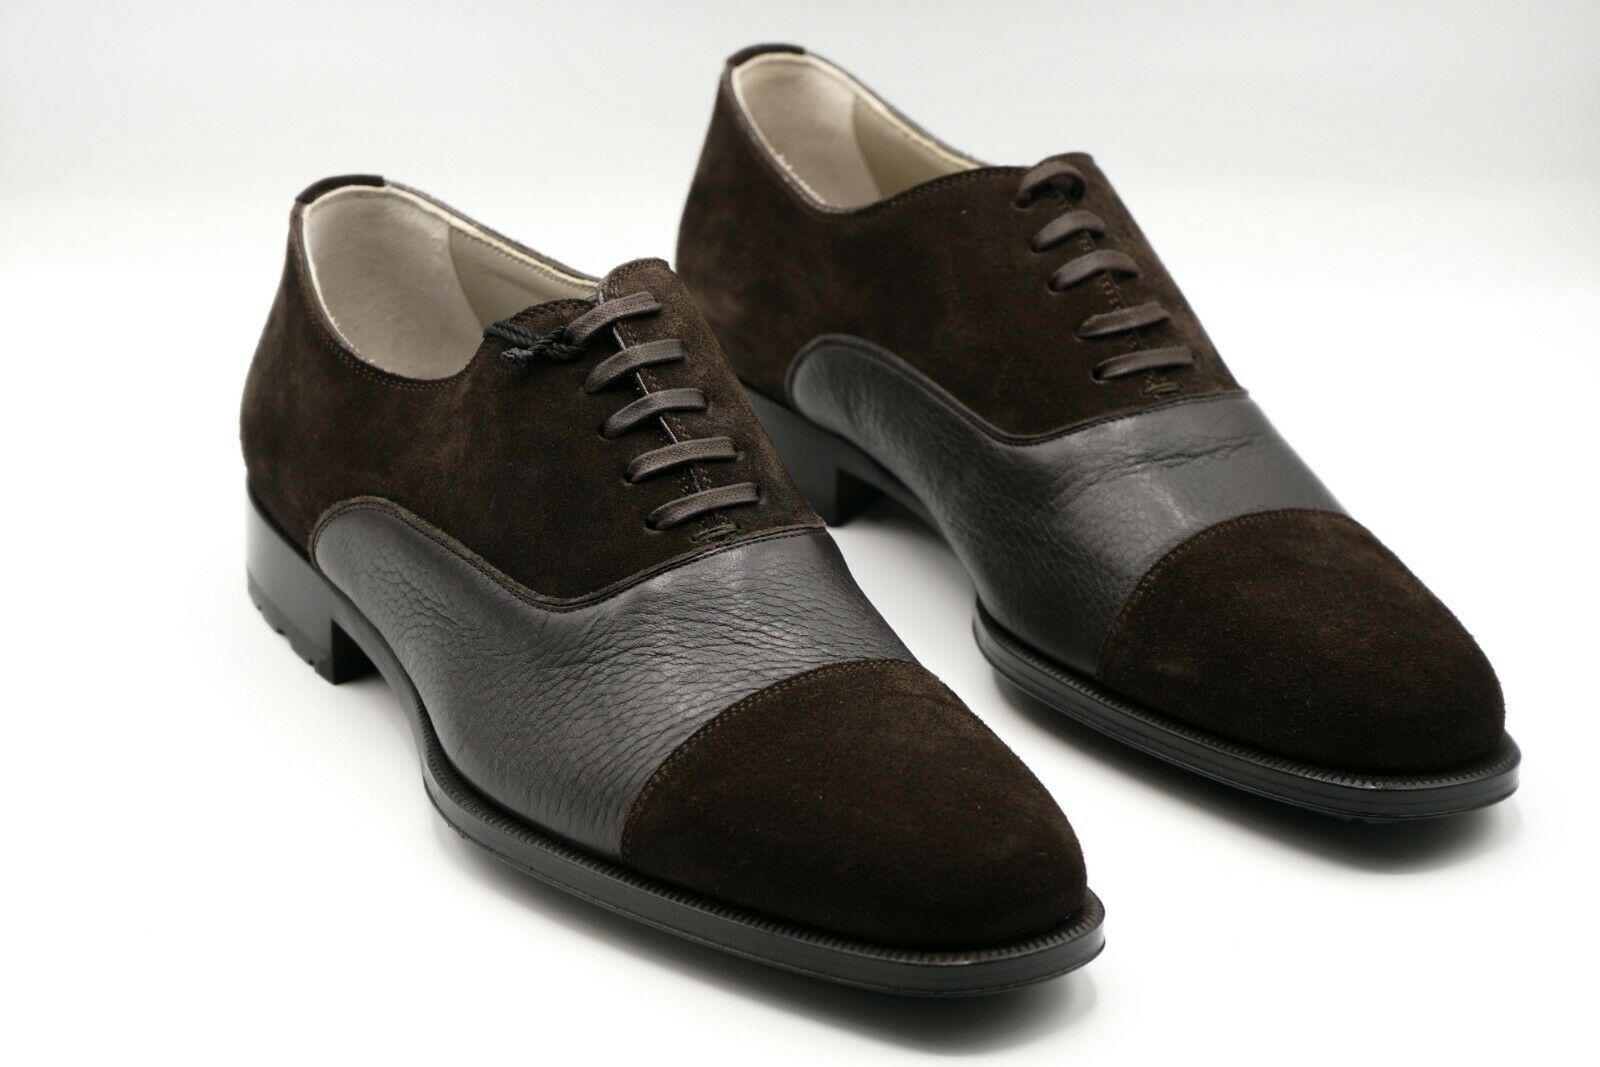 NEW KITON Napoli Dress Leather Shoes Size Eu 42 Uk 8 Us 9 (KIS20)